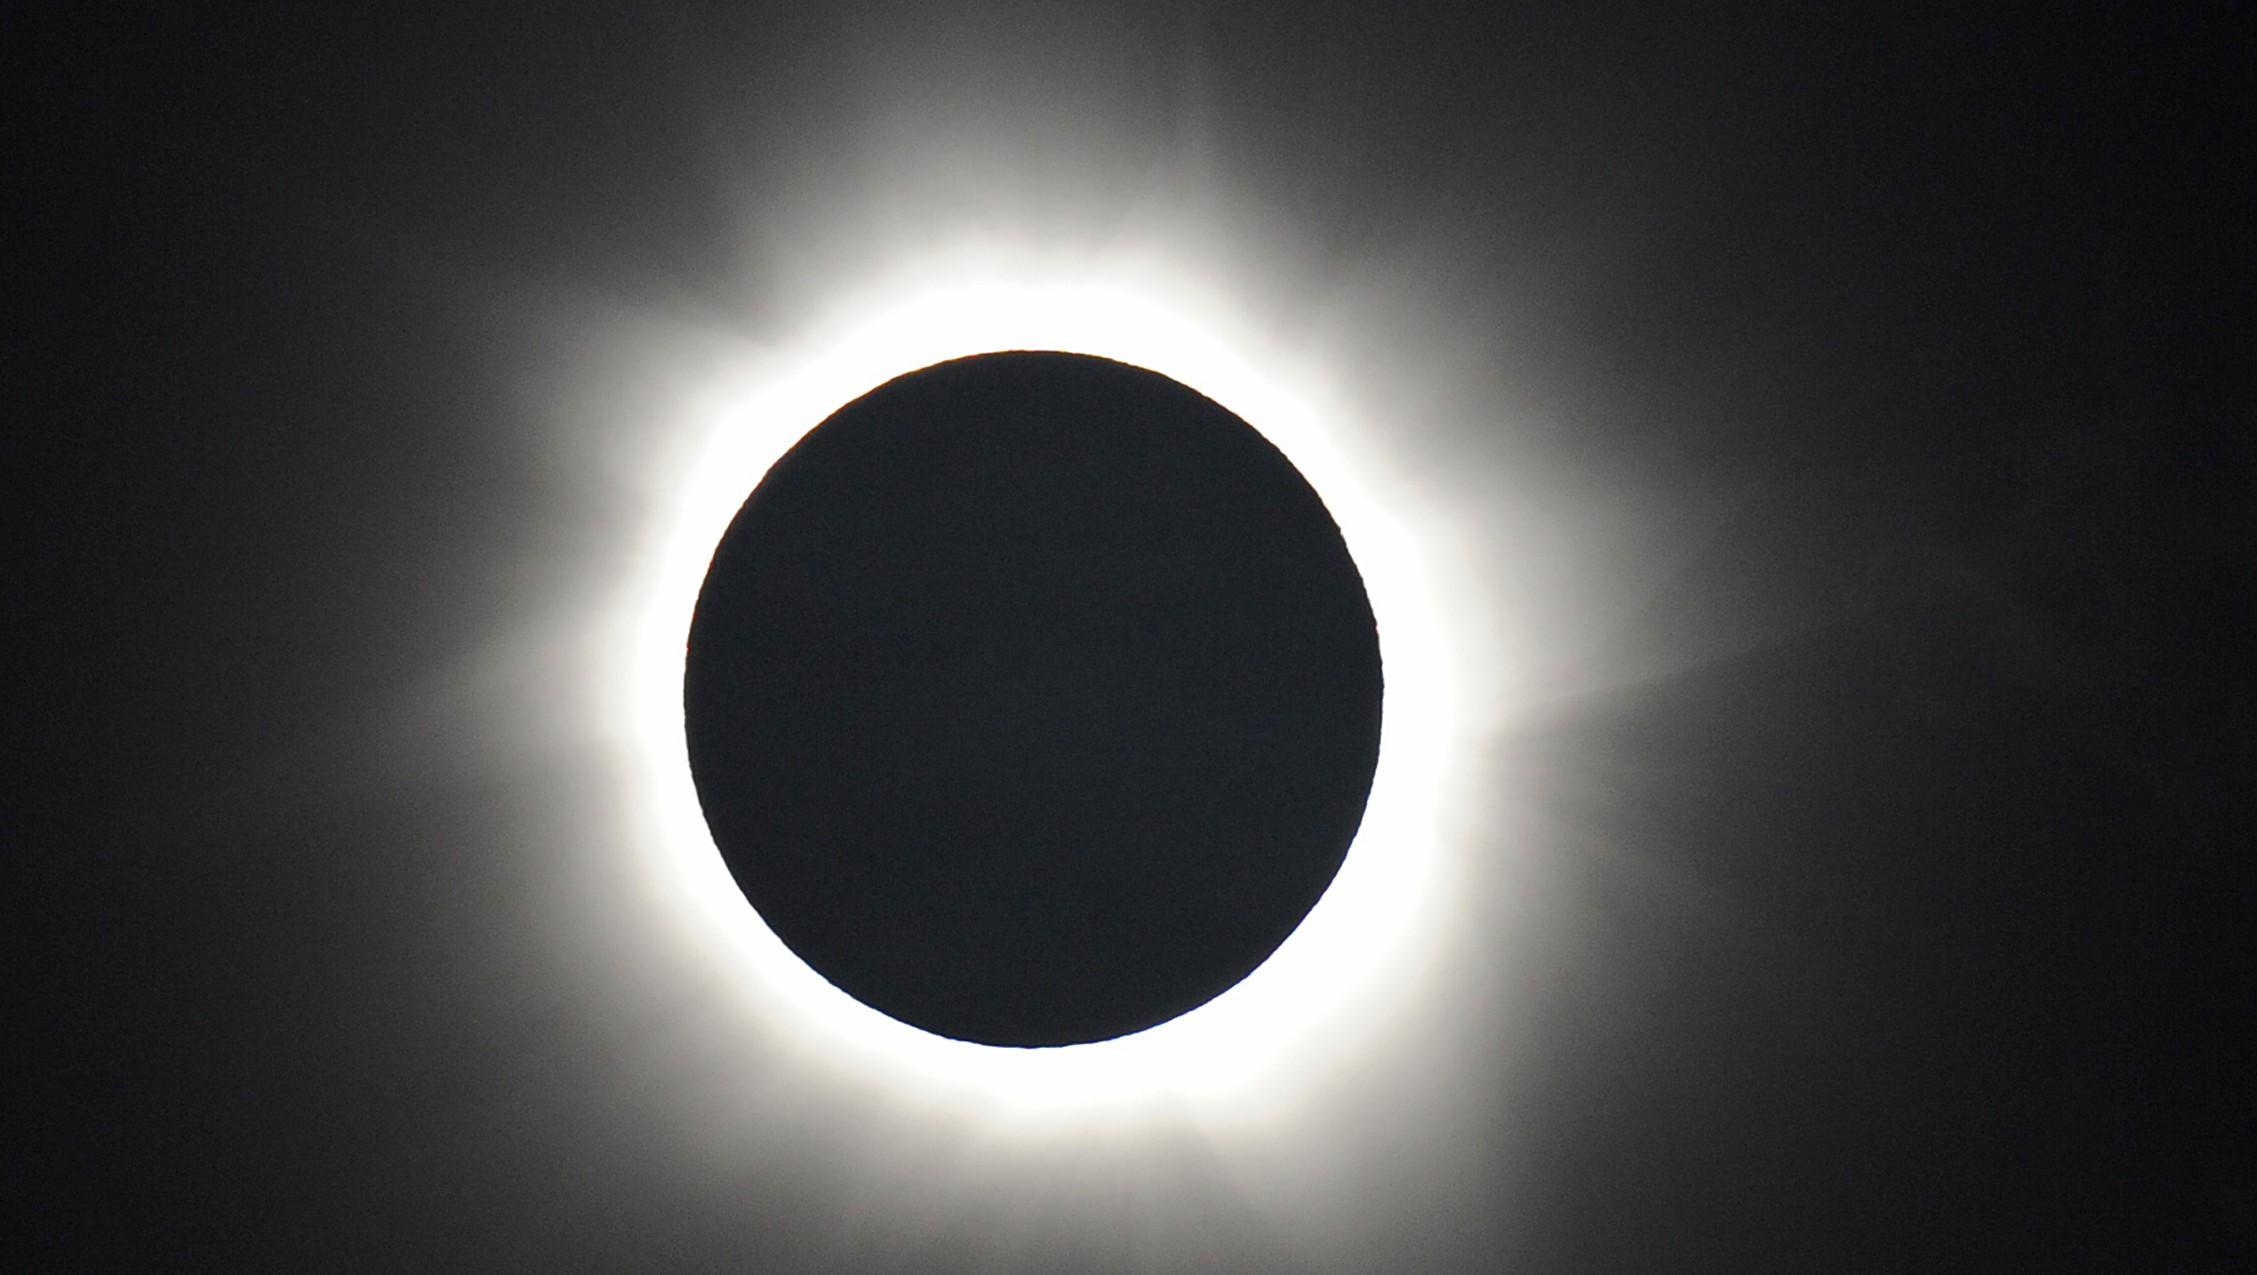 solar eclipse, when is the next solar eclipse